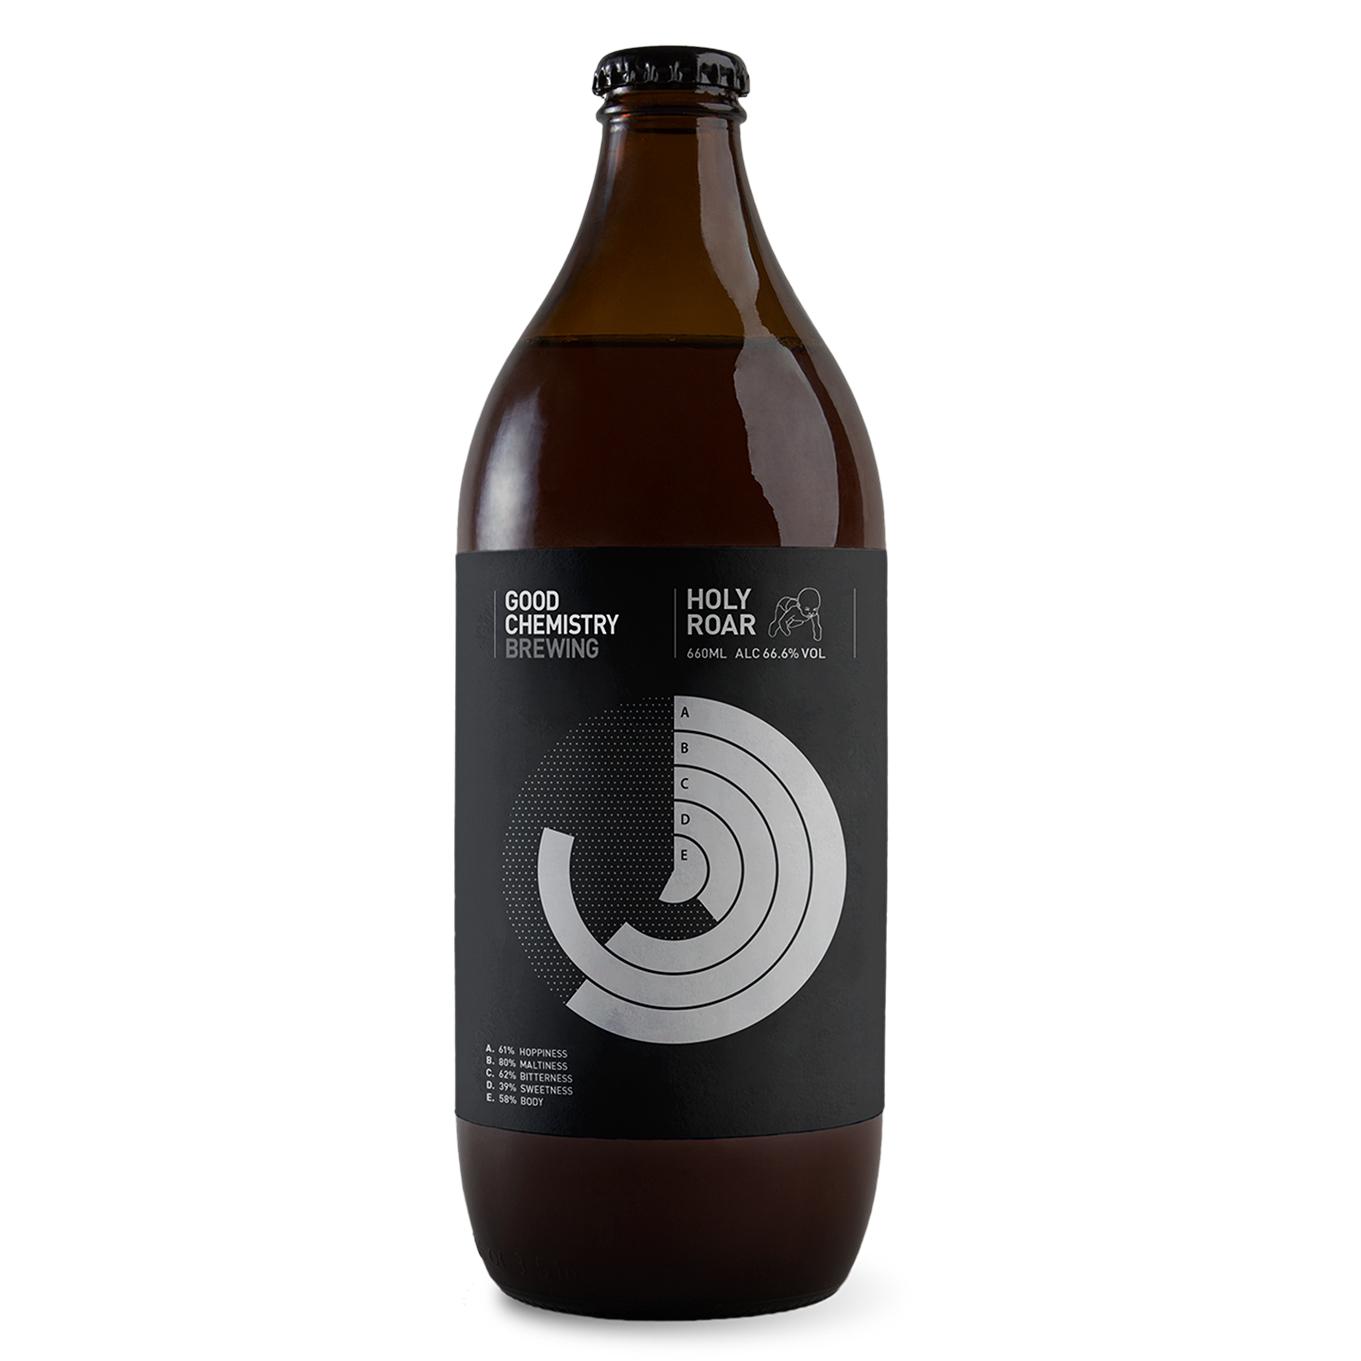 'Holy Roar' Good Chemistry beer 6.66% (ABV)